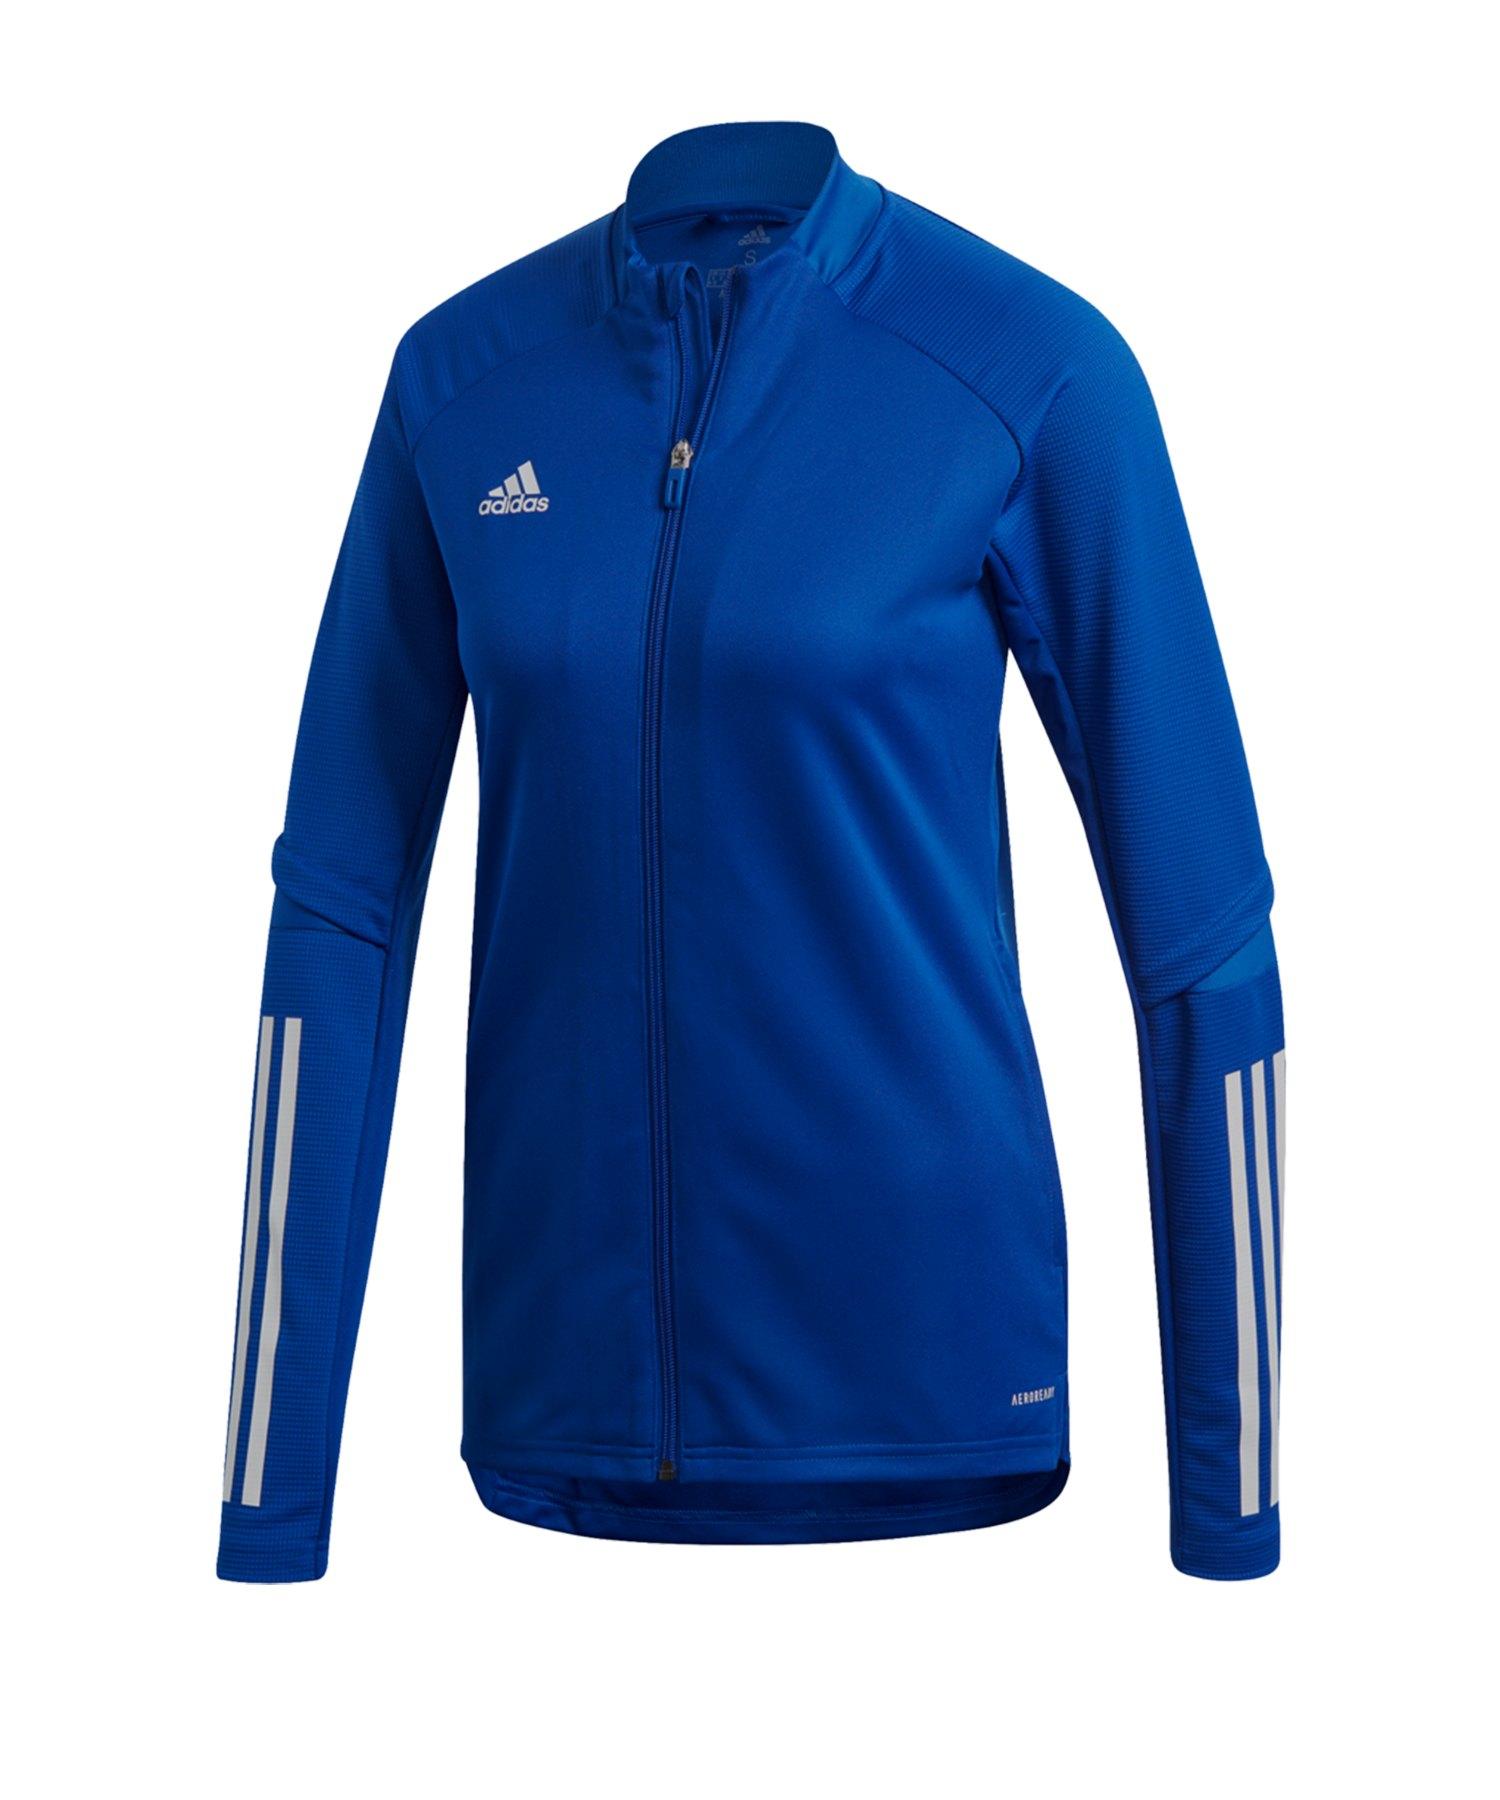 adidas Condivo 20 Trainingsjacke Damen Blau - blau